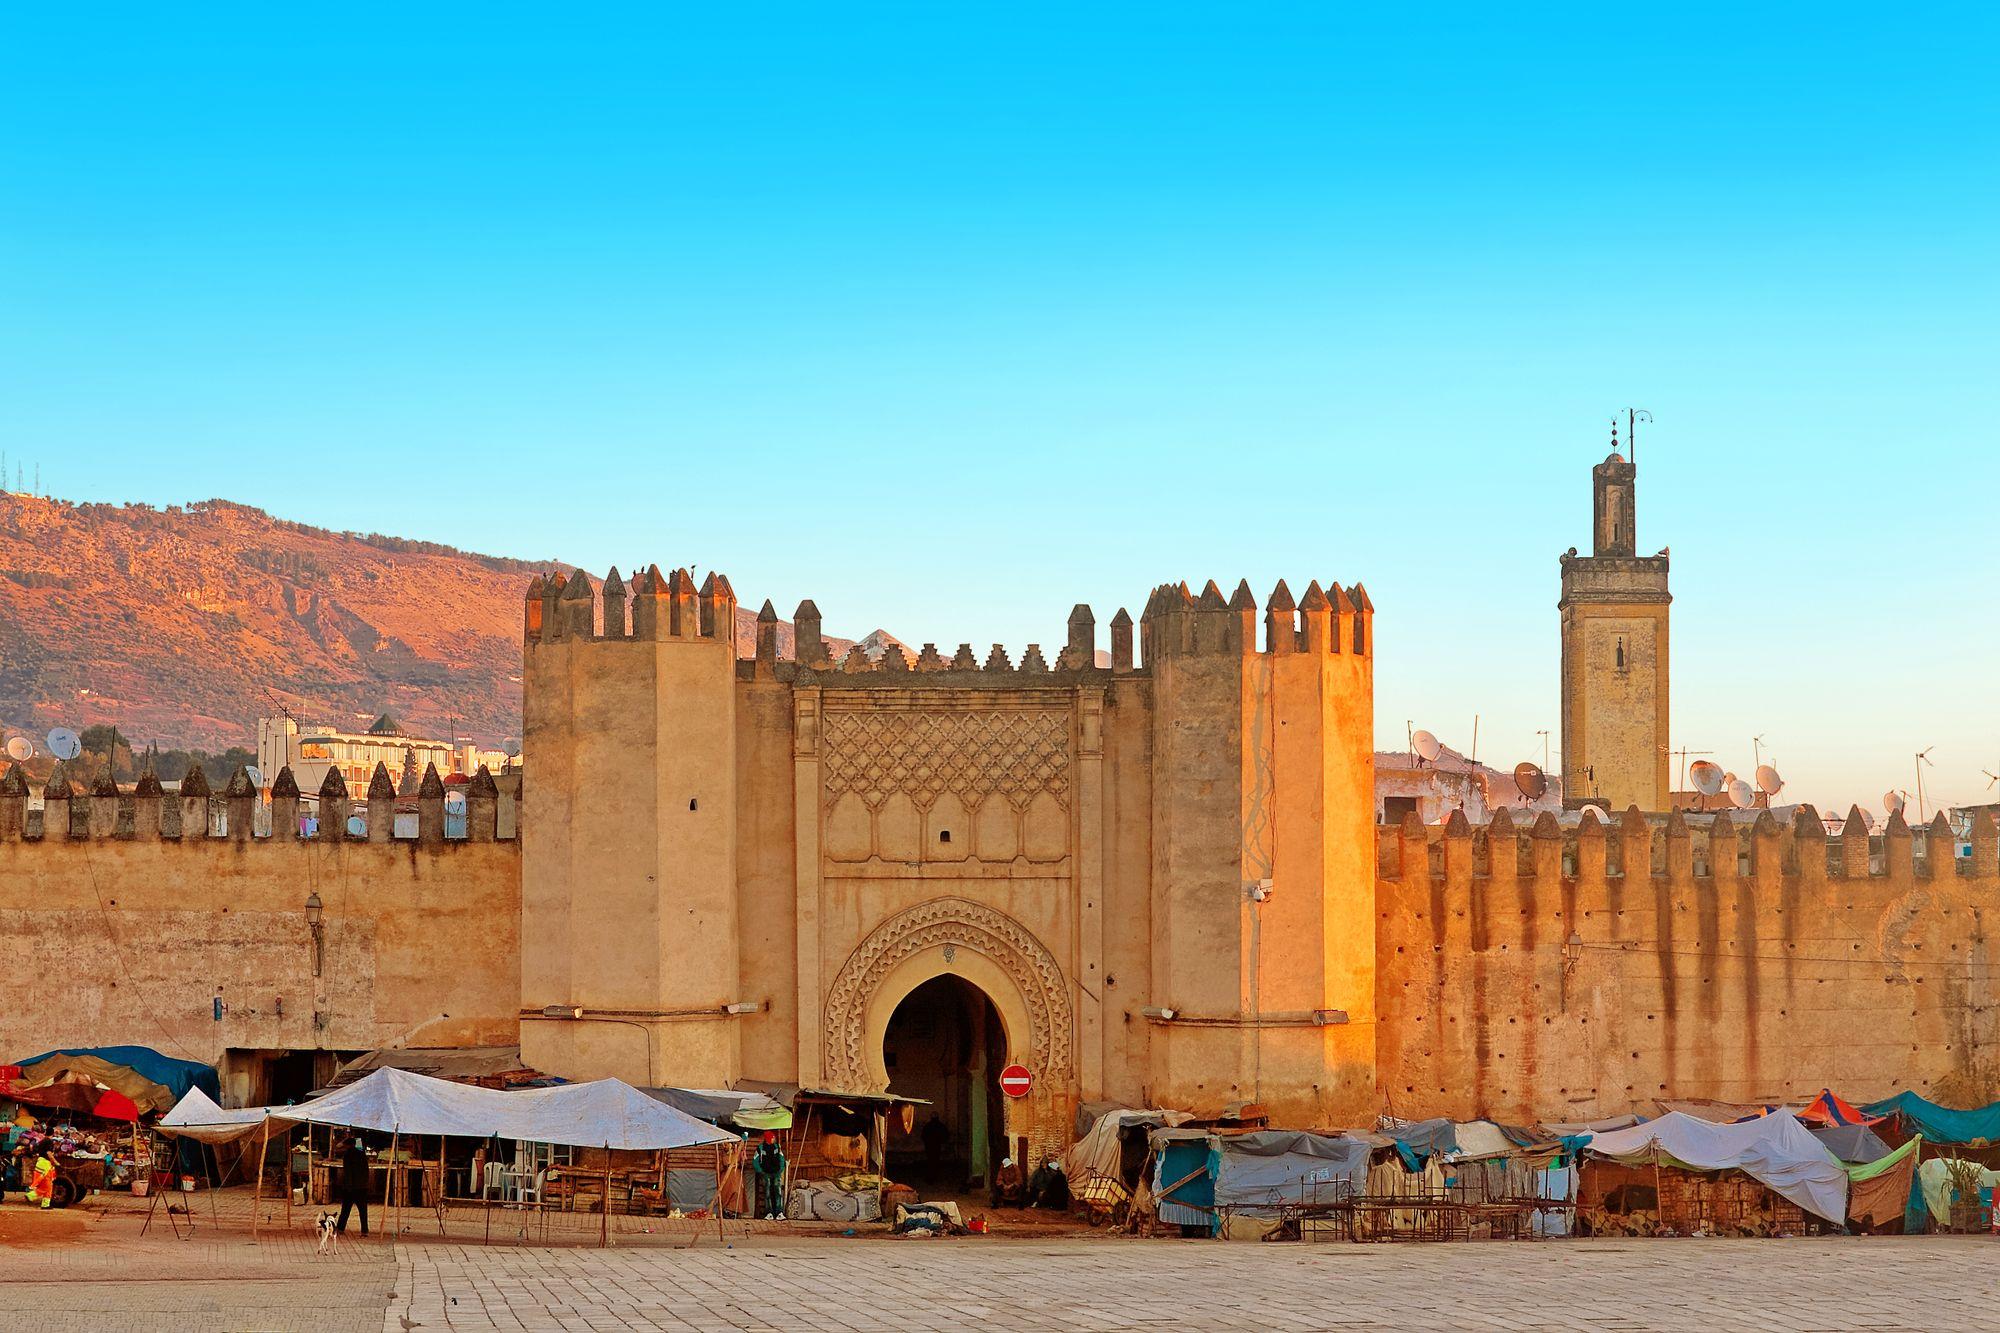 Gates to ancient medina of Fez, Morocco